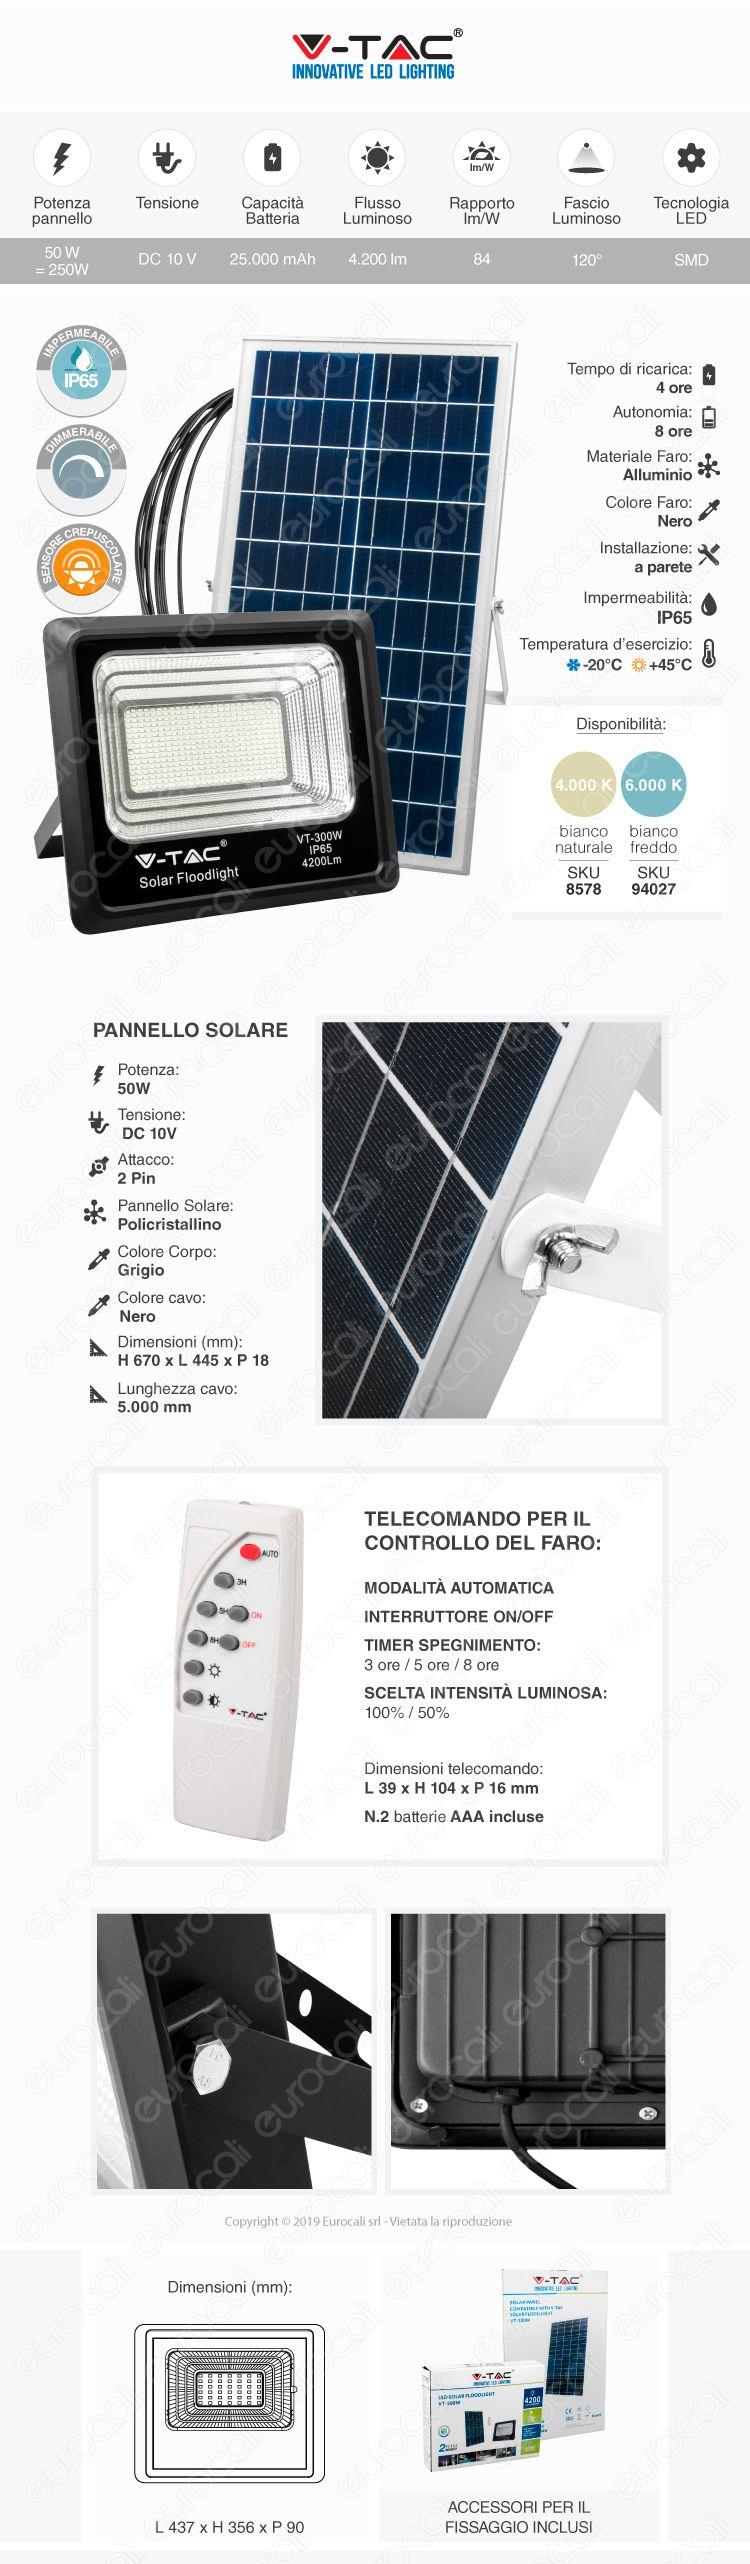 V-Tac PRO VT-2953 Lampada da Muro Wall Light LED CREE 3W + SMD 6W Bianco